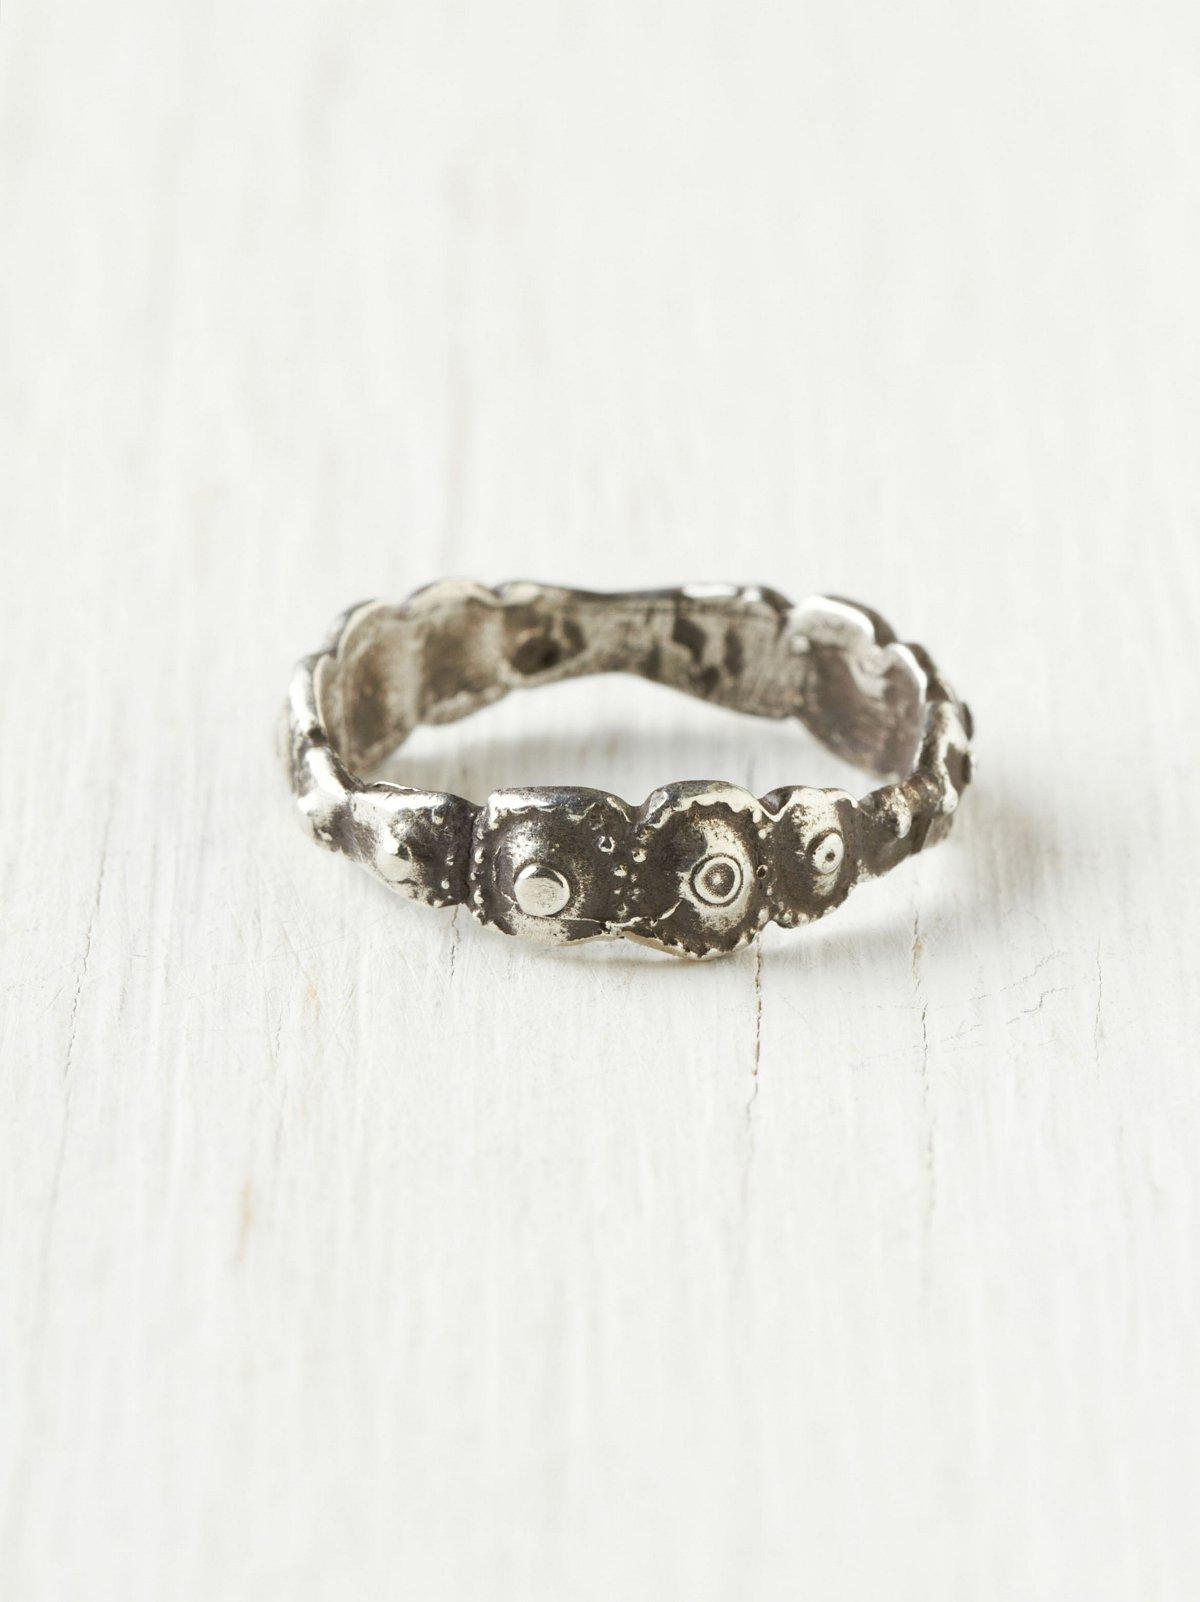 Sea Urchin Band Ring